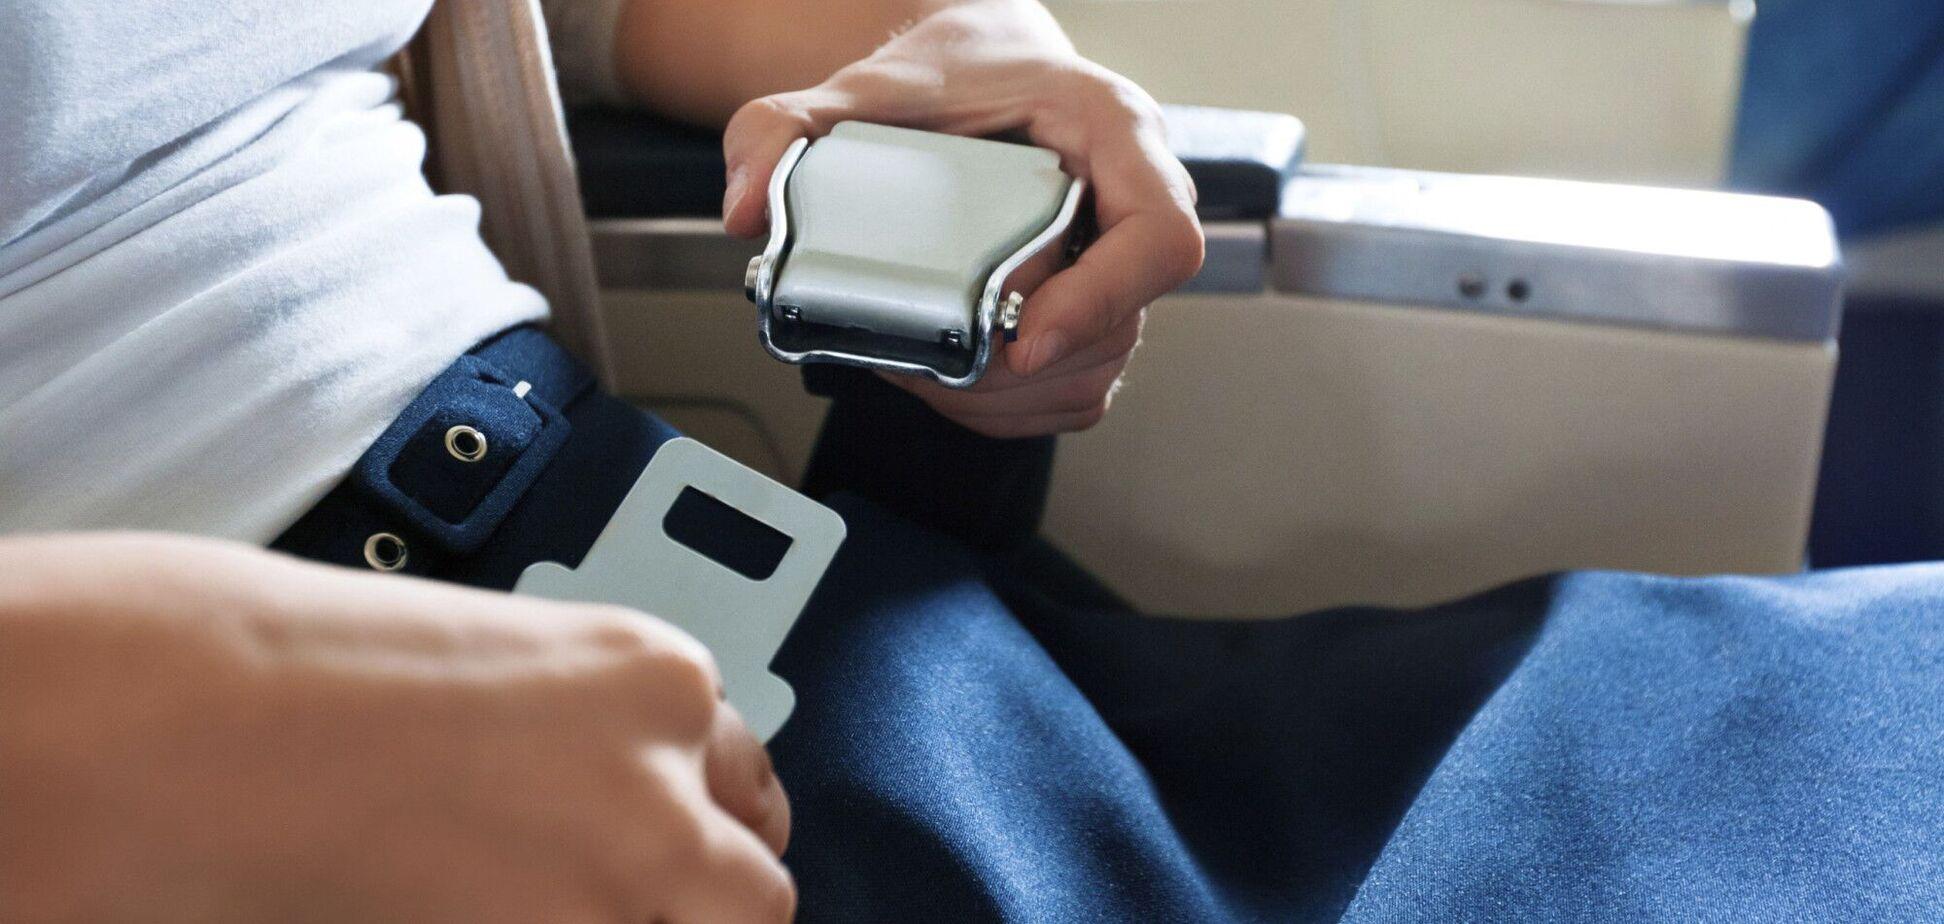 Названа реальная функция ремня безопасности на борту самолета